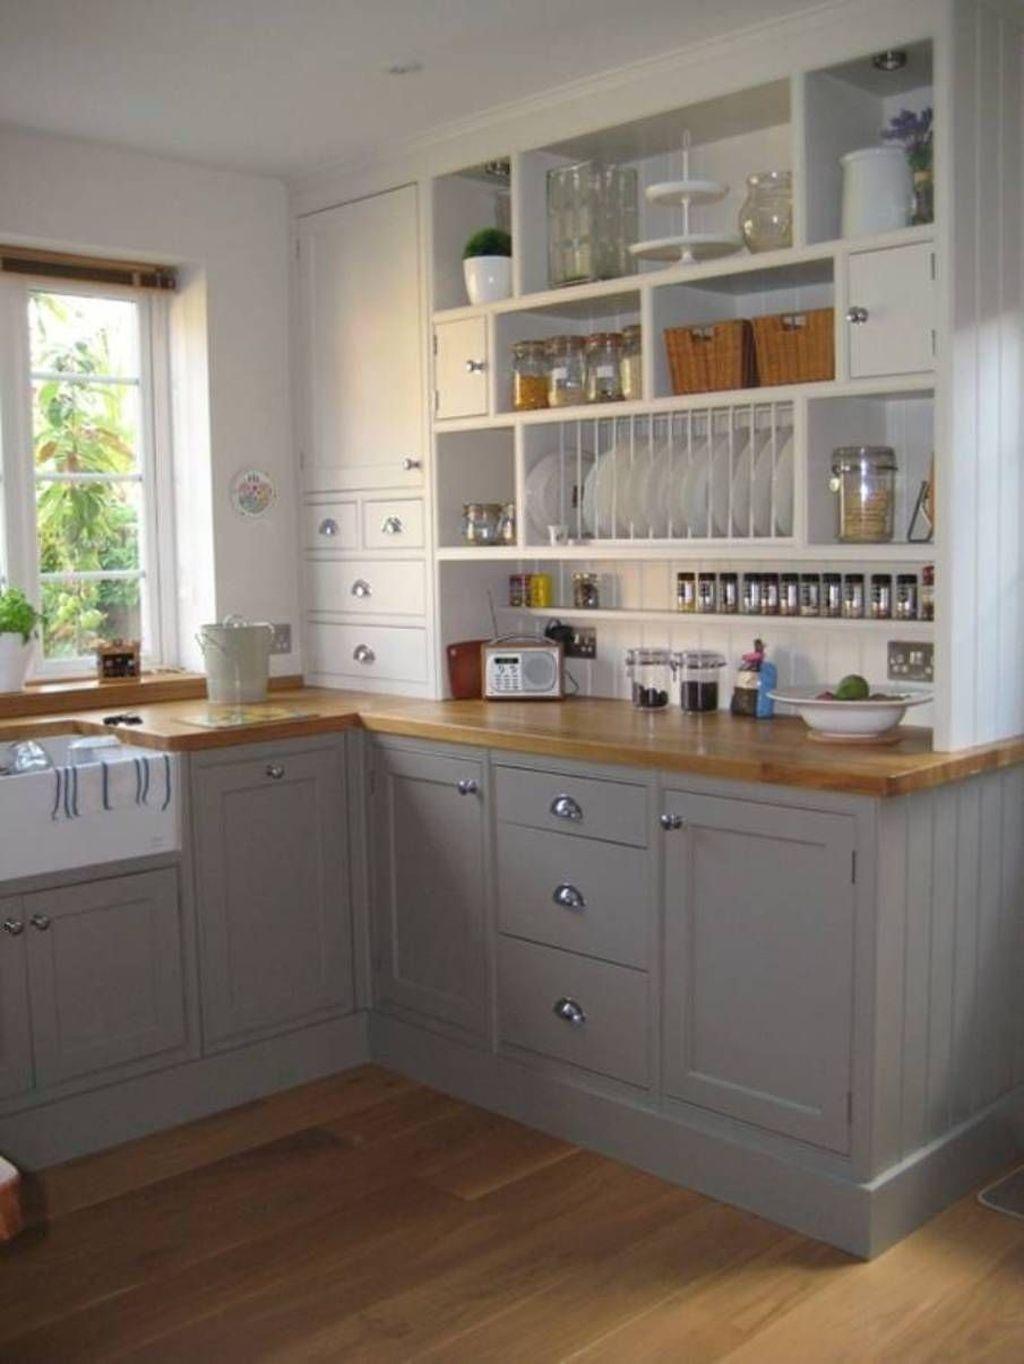 small galley kitchen ideas uk  Small kitchen layouts, Kitchen